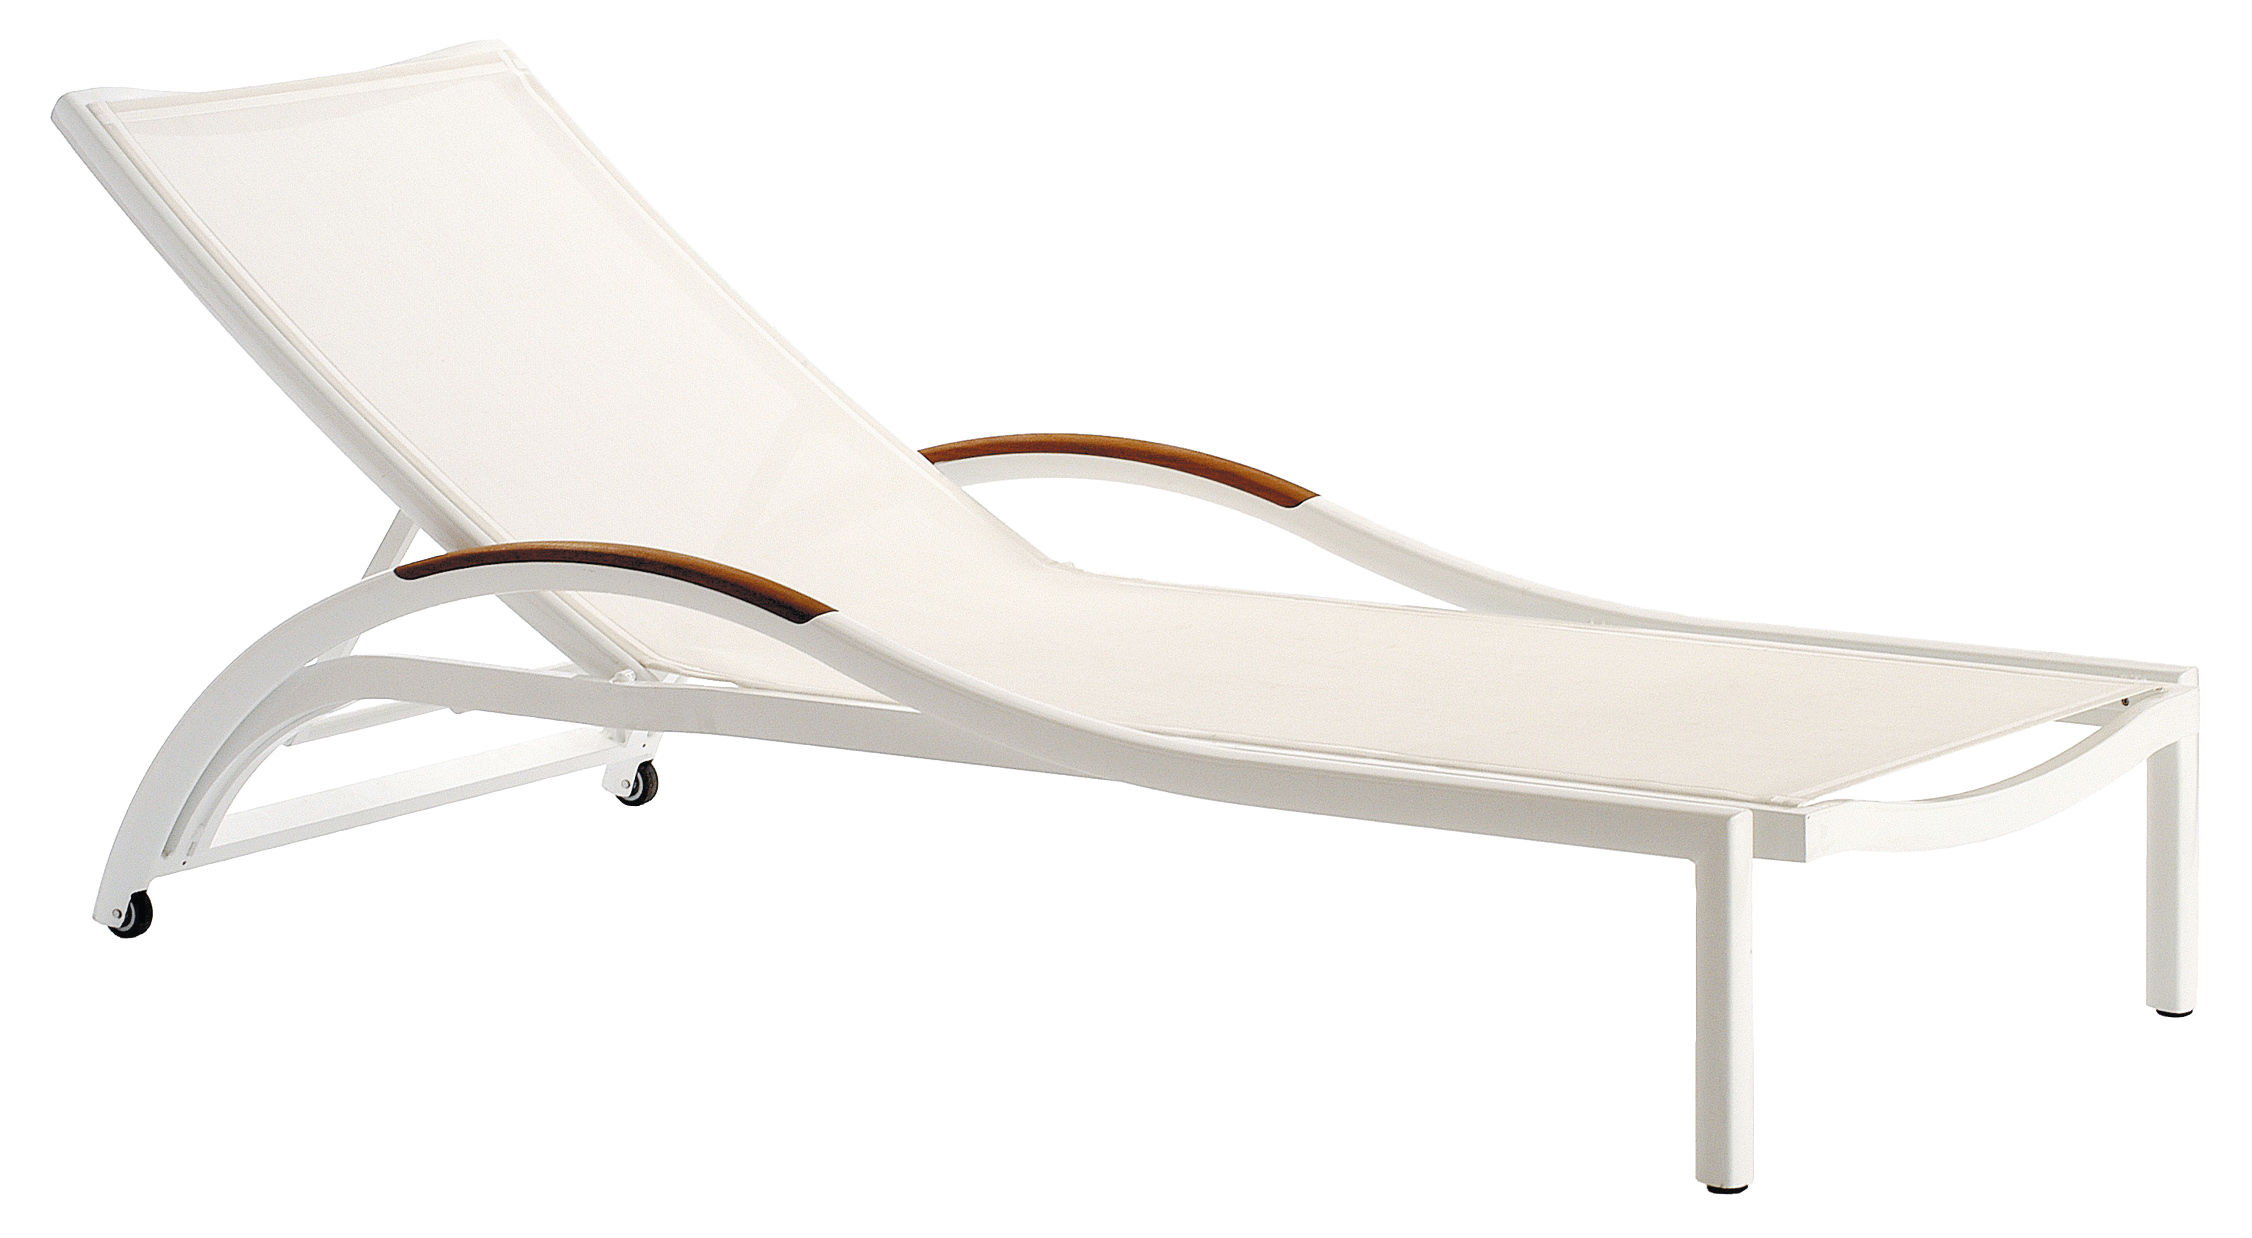 bain de soleil ego premiere teck toile blanche made in. Black Bedroom Furniture Sets. Home Design Ideas